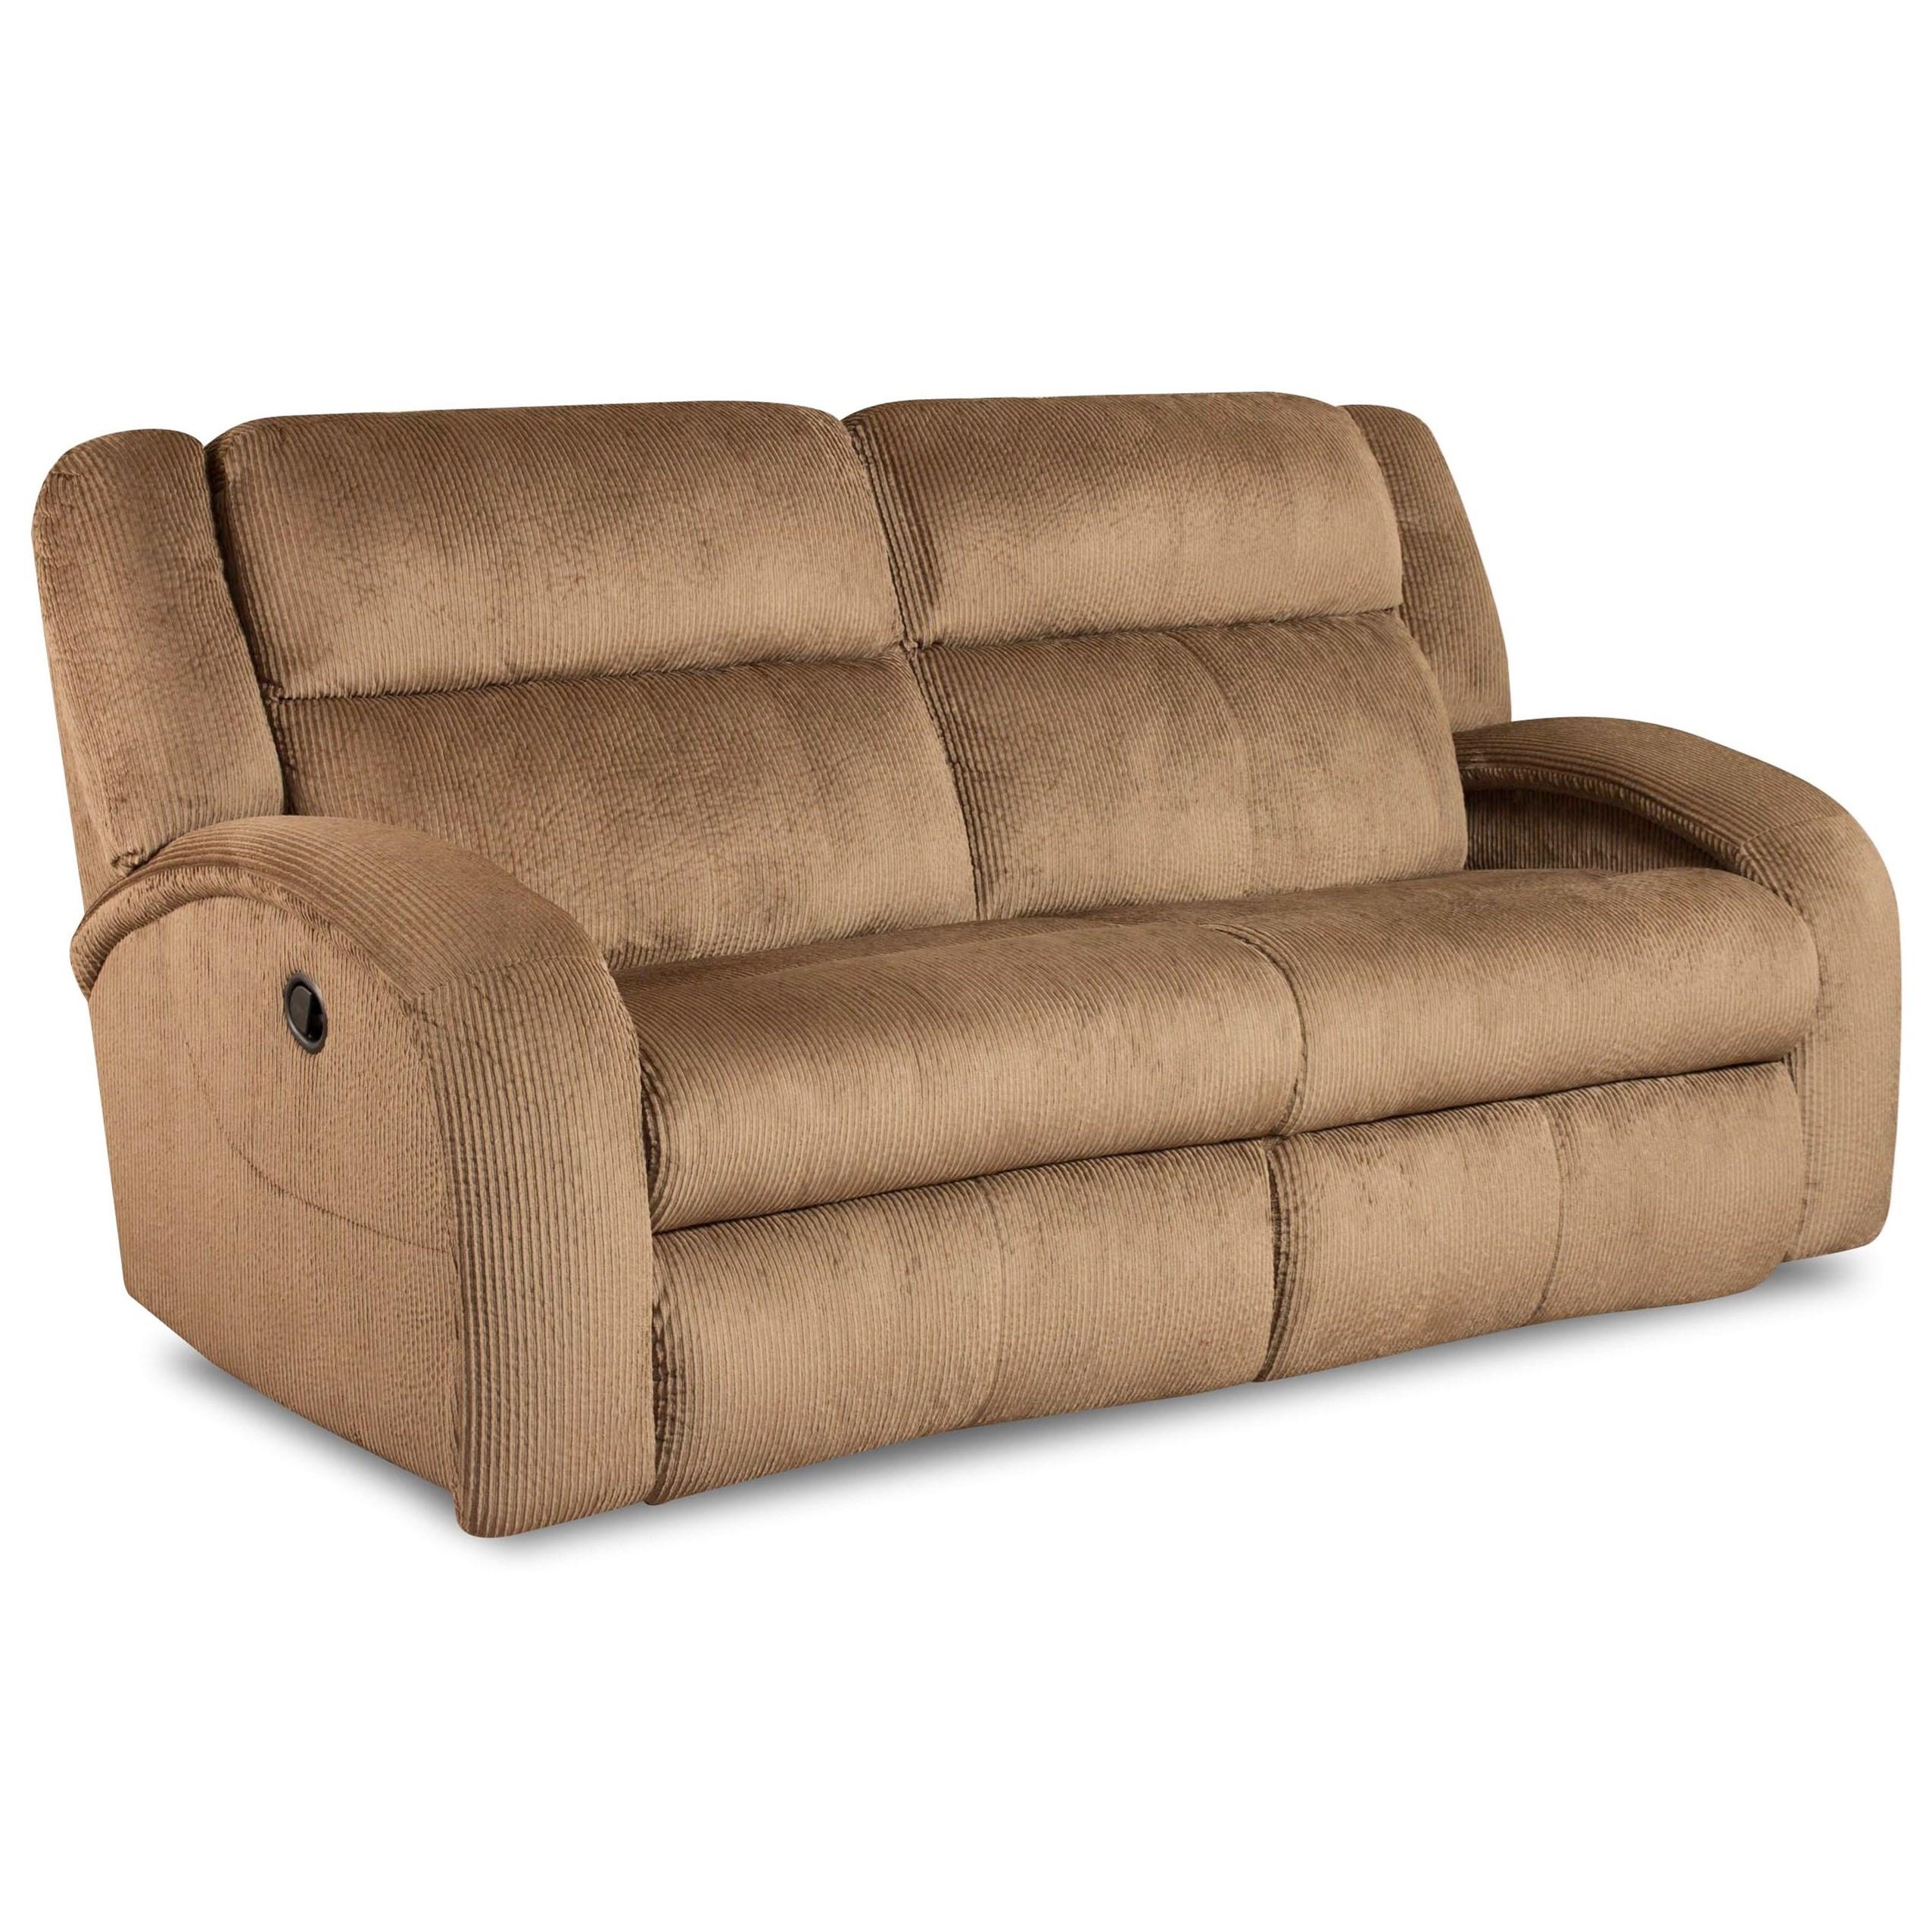 Southern Motion Maverick Layflat Reclining Sofa With